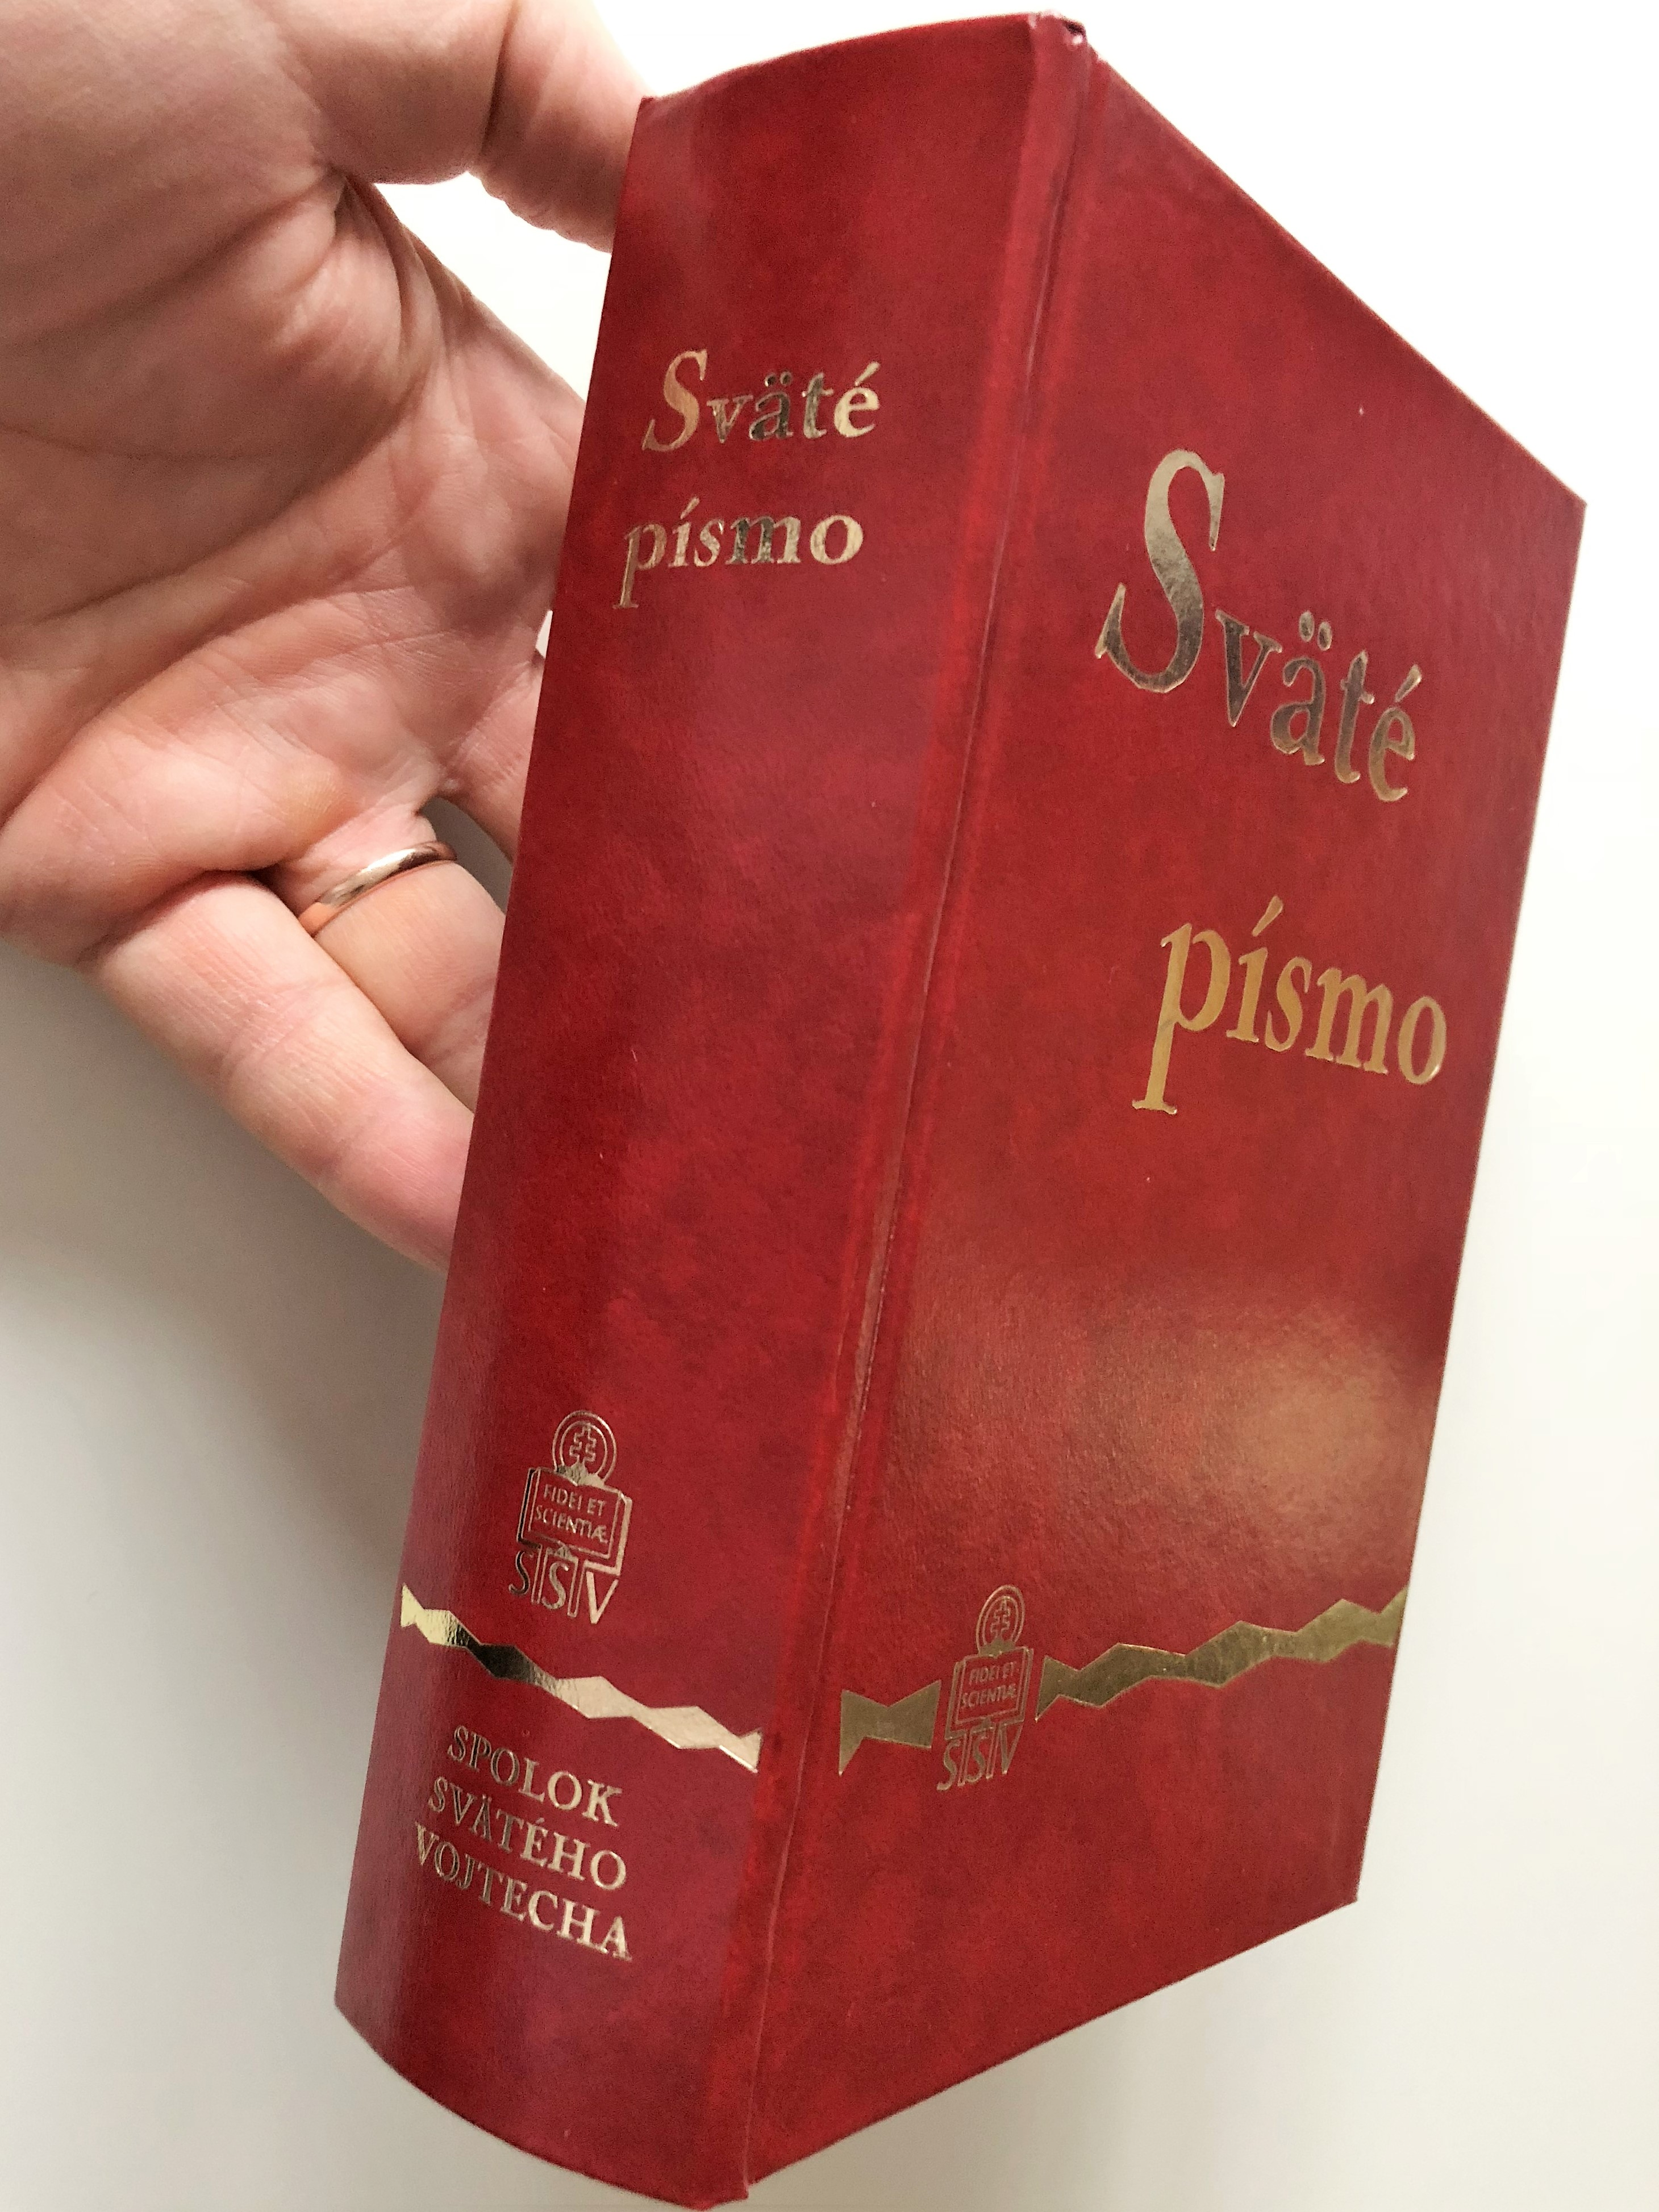 slovak-catholic-study-bible-for-students-2-.jpg